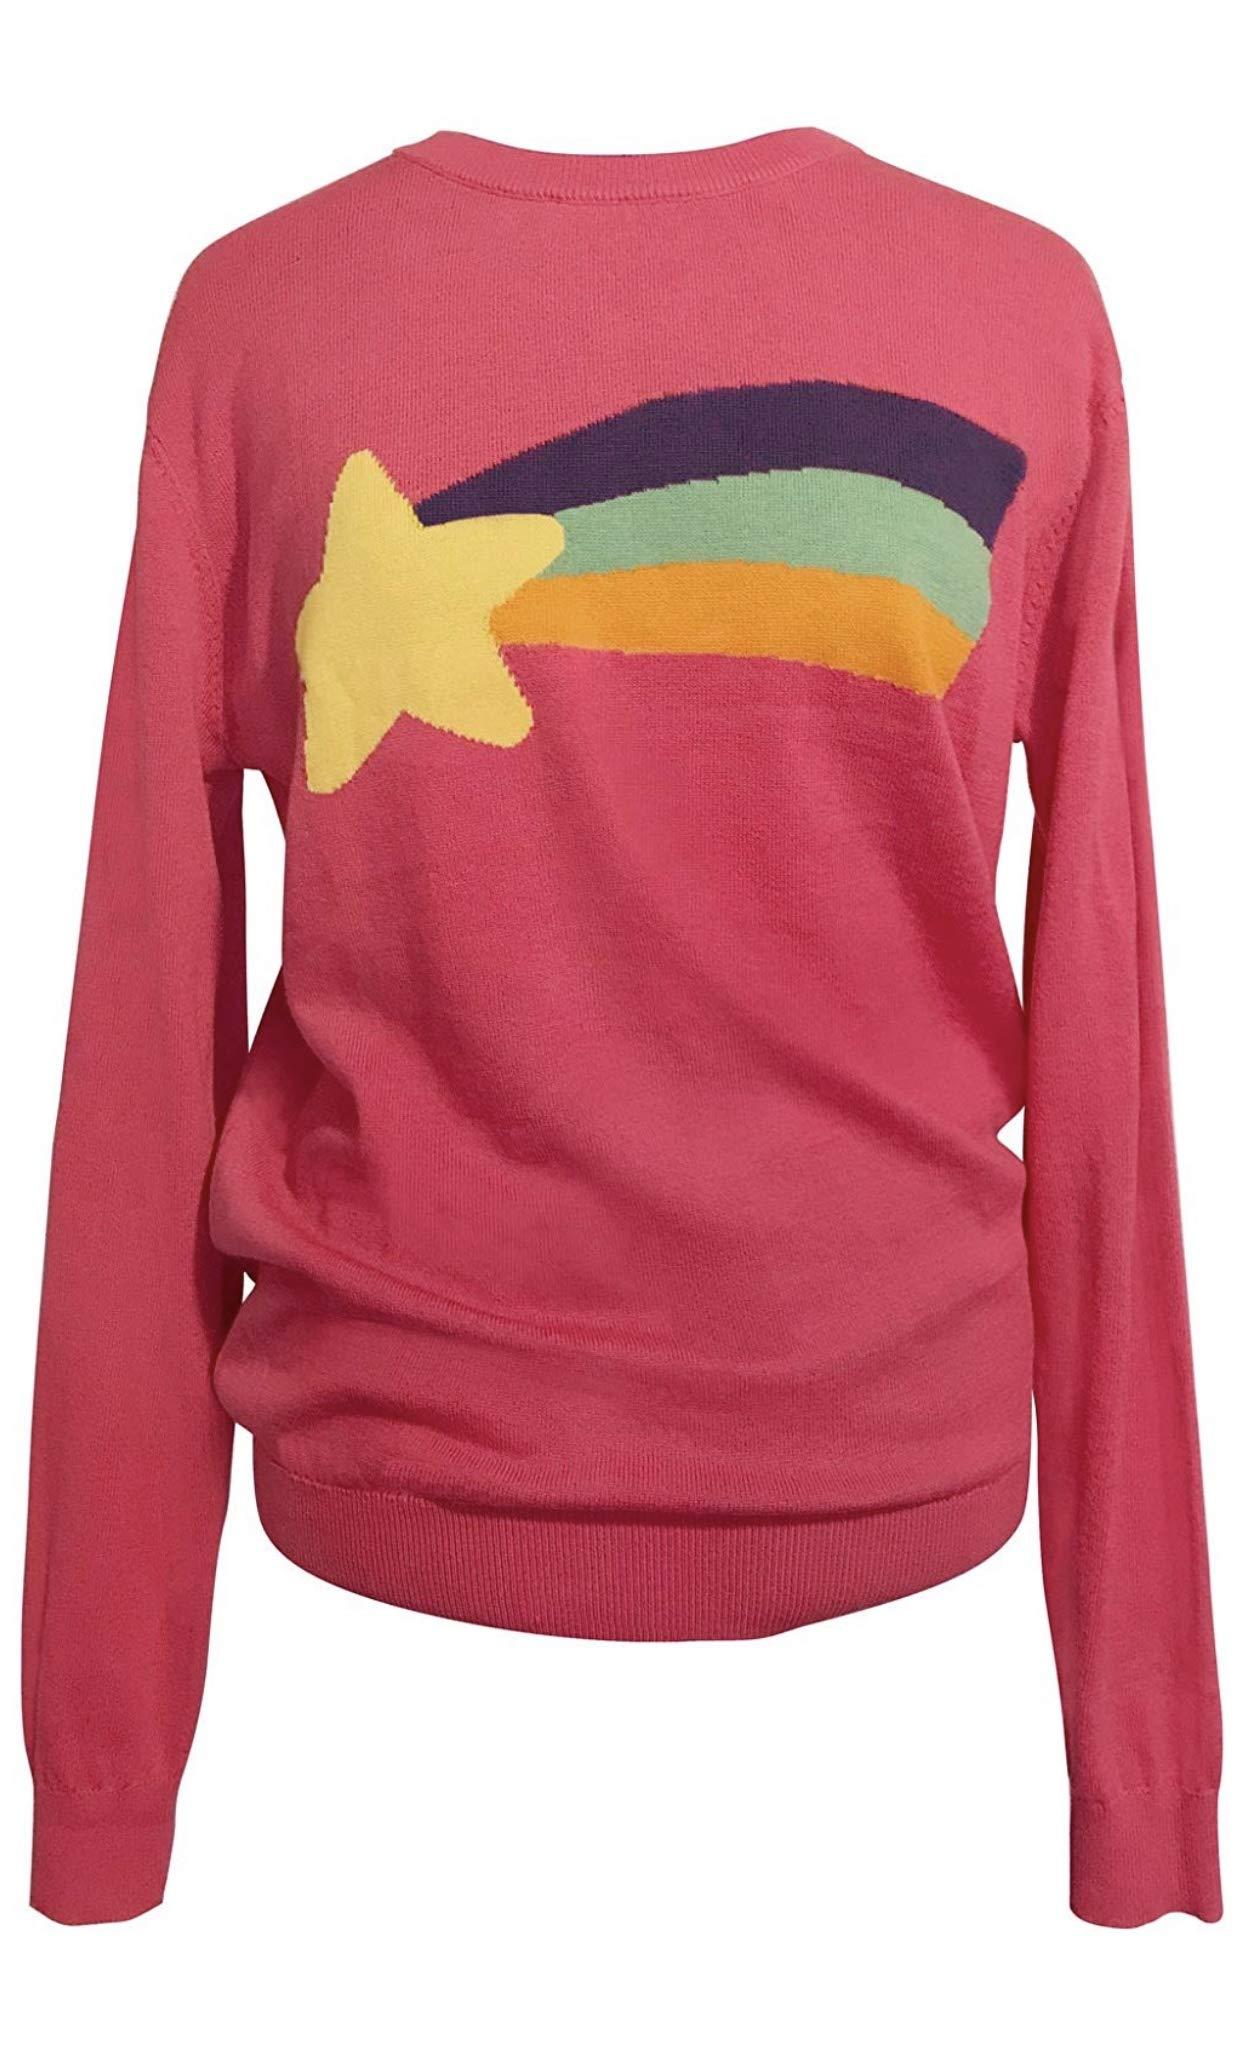 4f405acd3f27 Amazon.com  Gravity falls - Shooting Star Sweater  Clothing